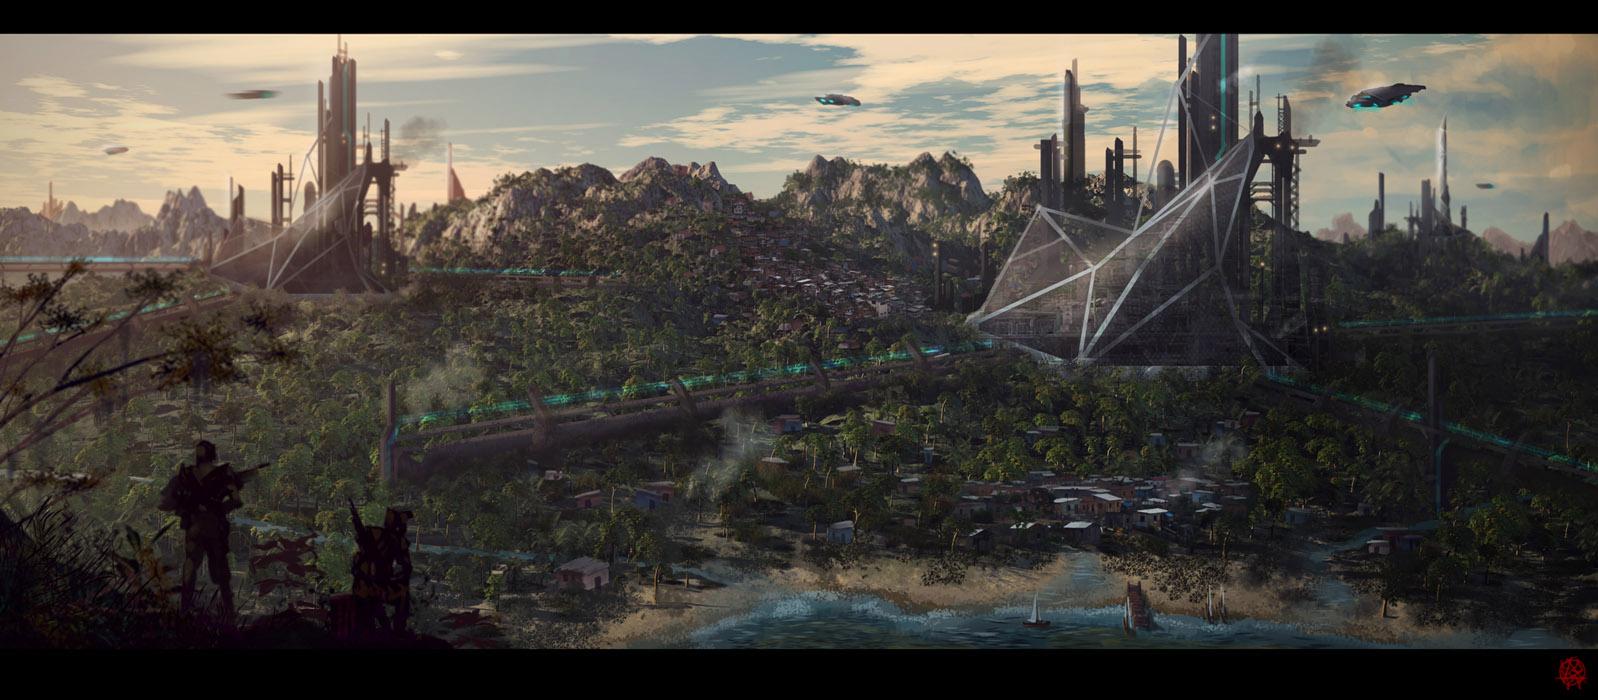 jungle mining by TheArtofSaul